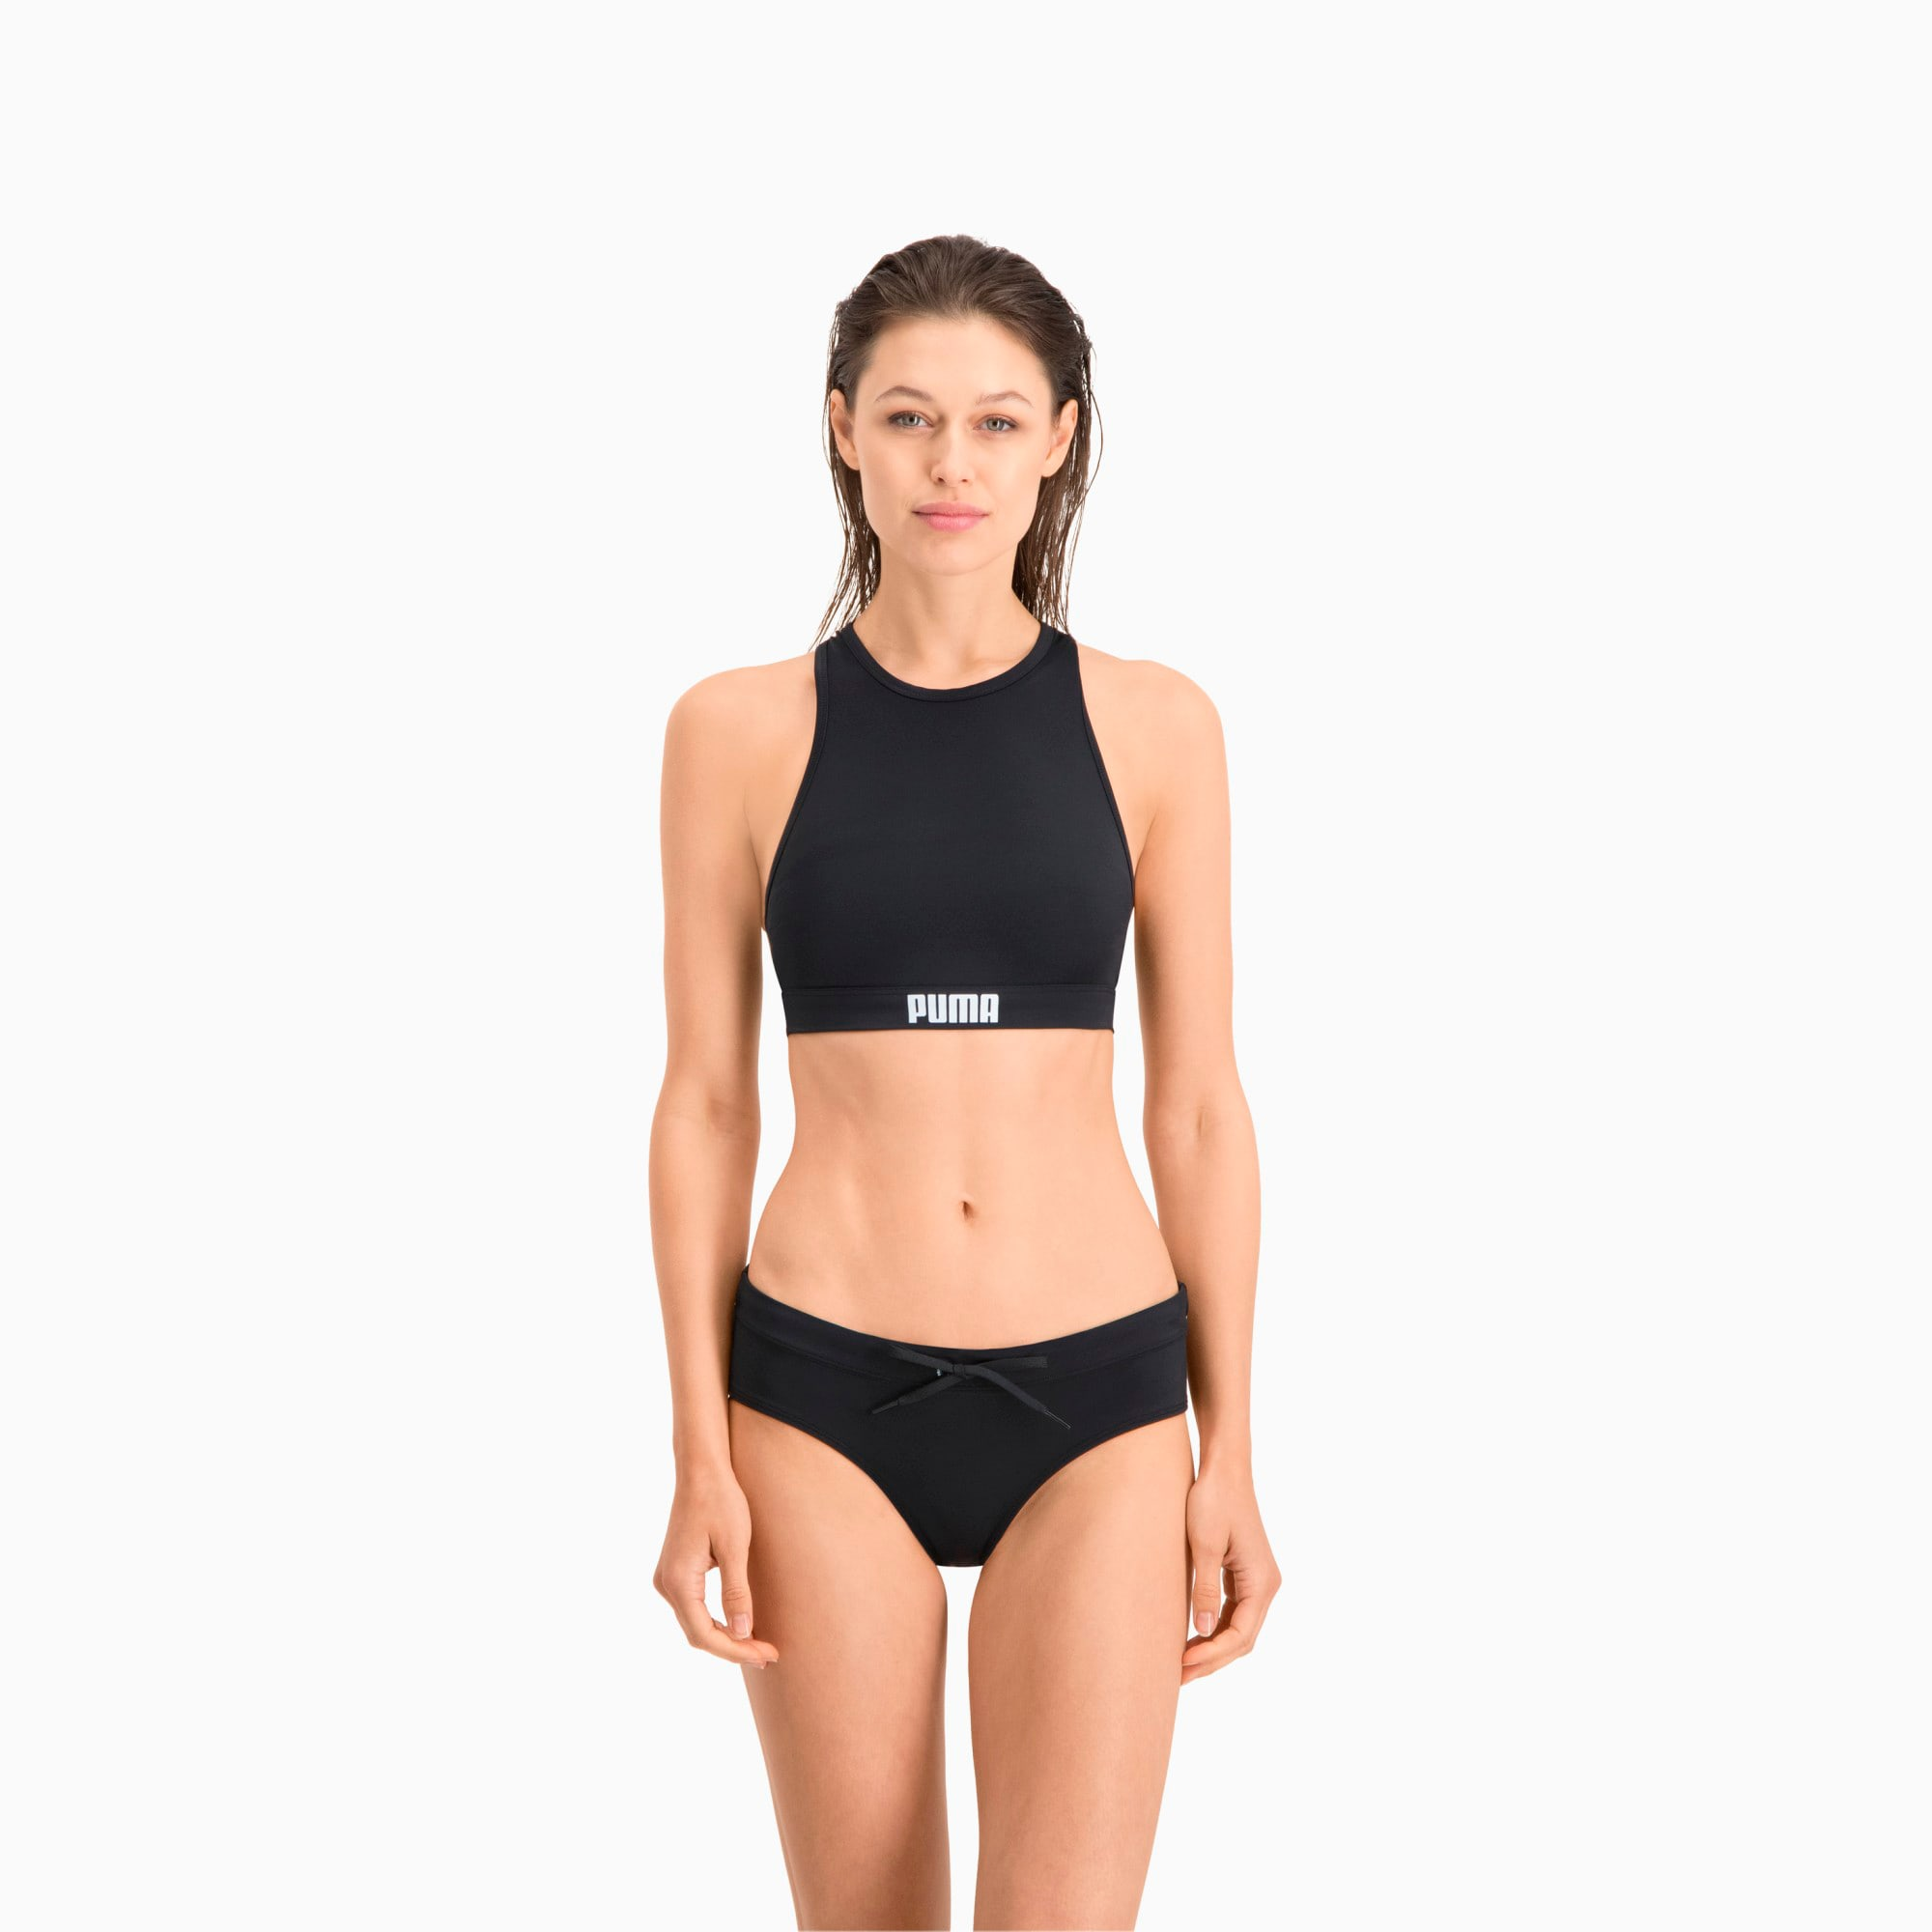 PUMA Swim Women's Hipster Bikini Bottom   PUMA Swimwear   PUMA ...